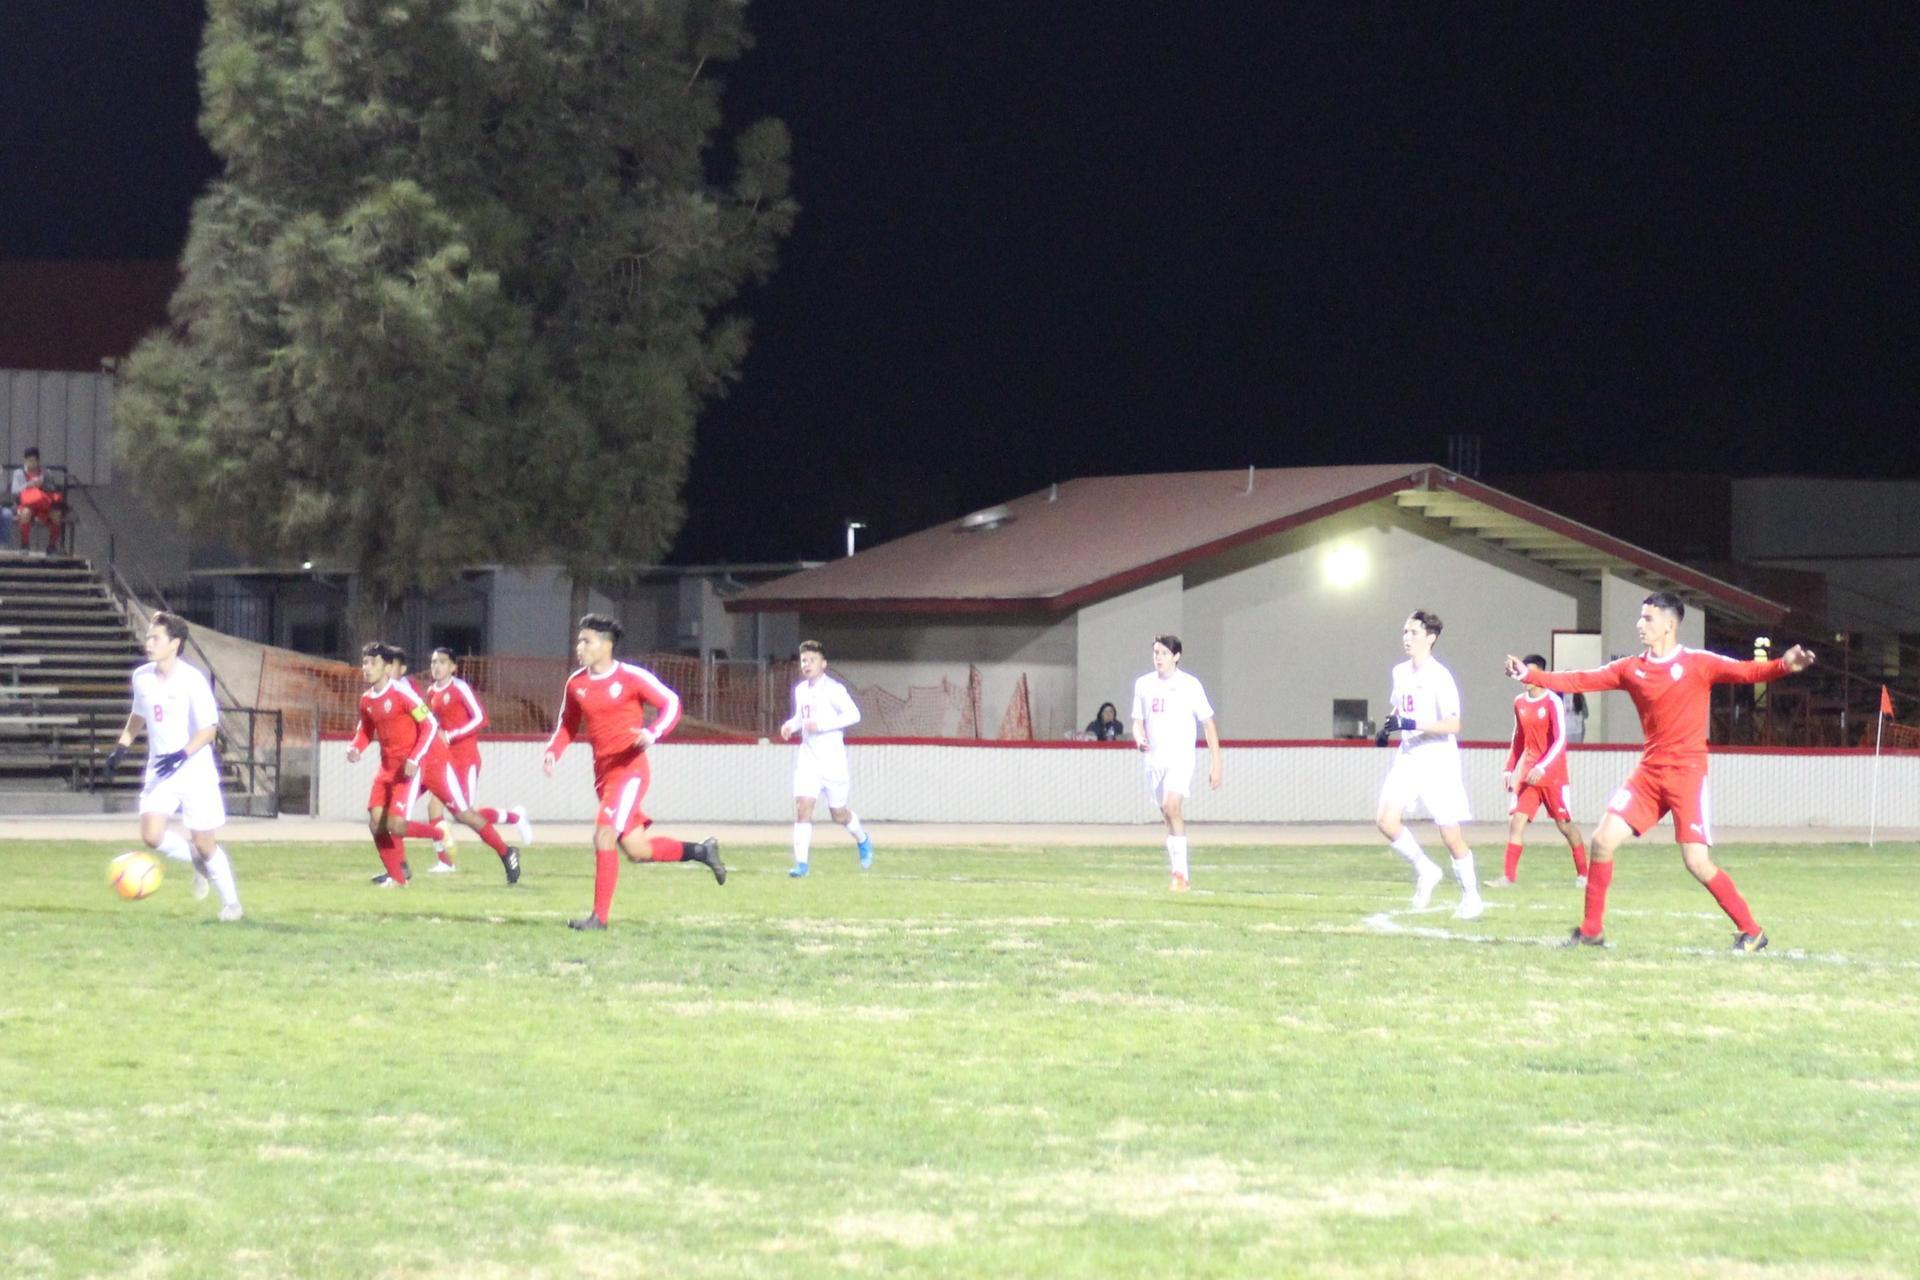 Christian Fernandez kicking